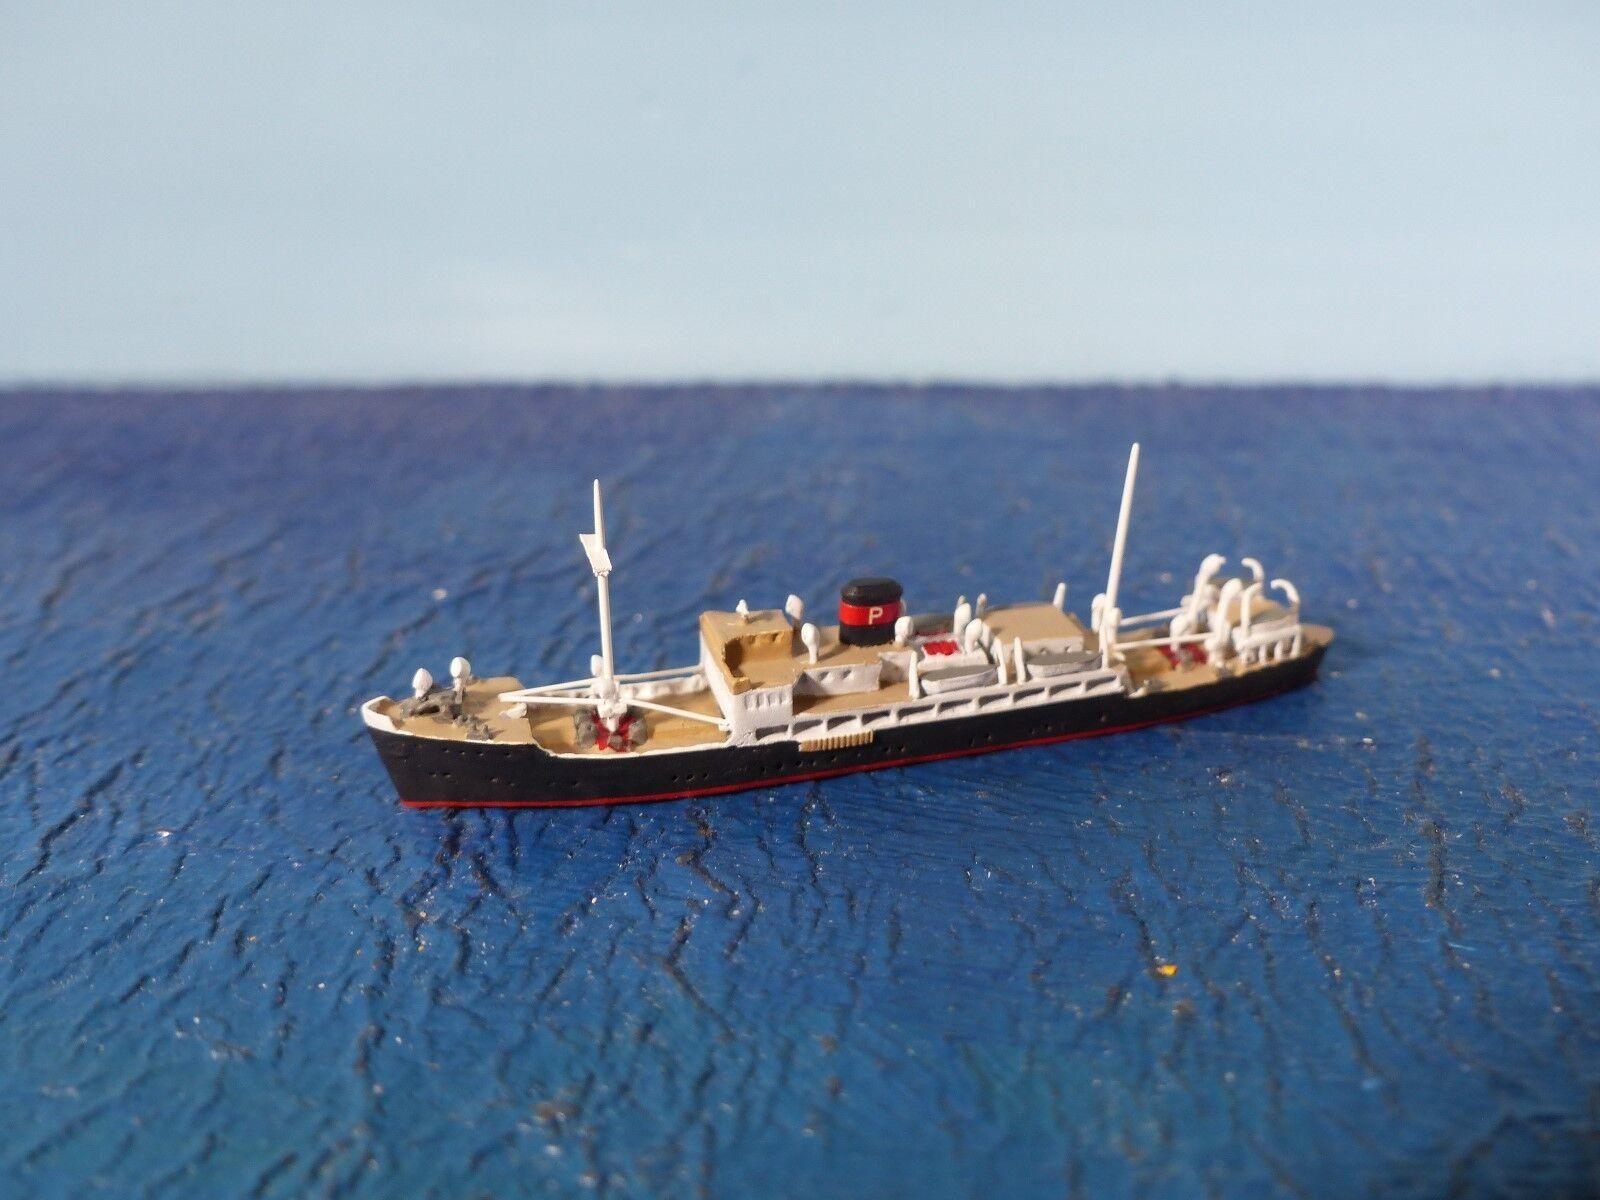 Mare Nostrum 1 1250 it. buque  brioni-class  MN 24a nuevo embalaje original